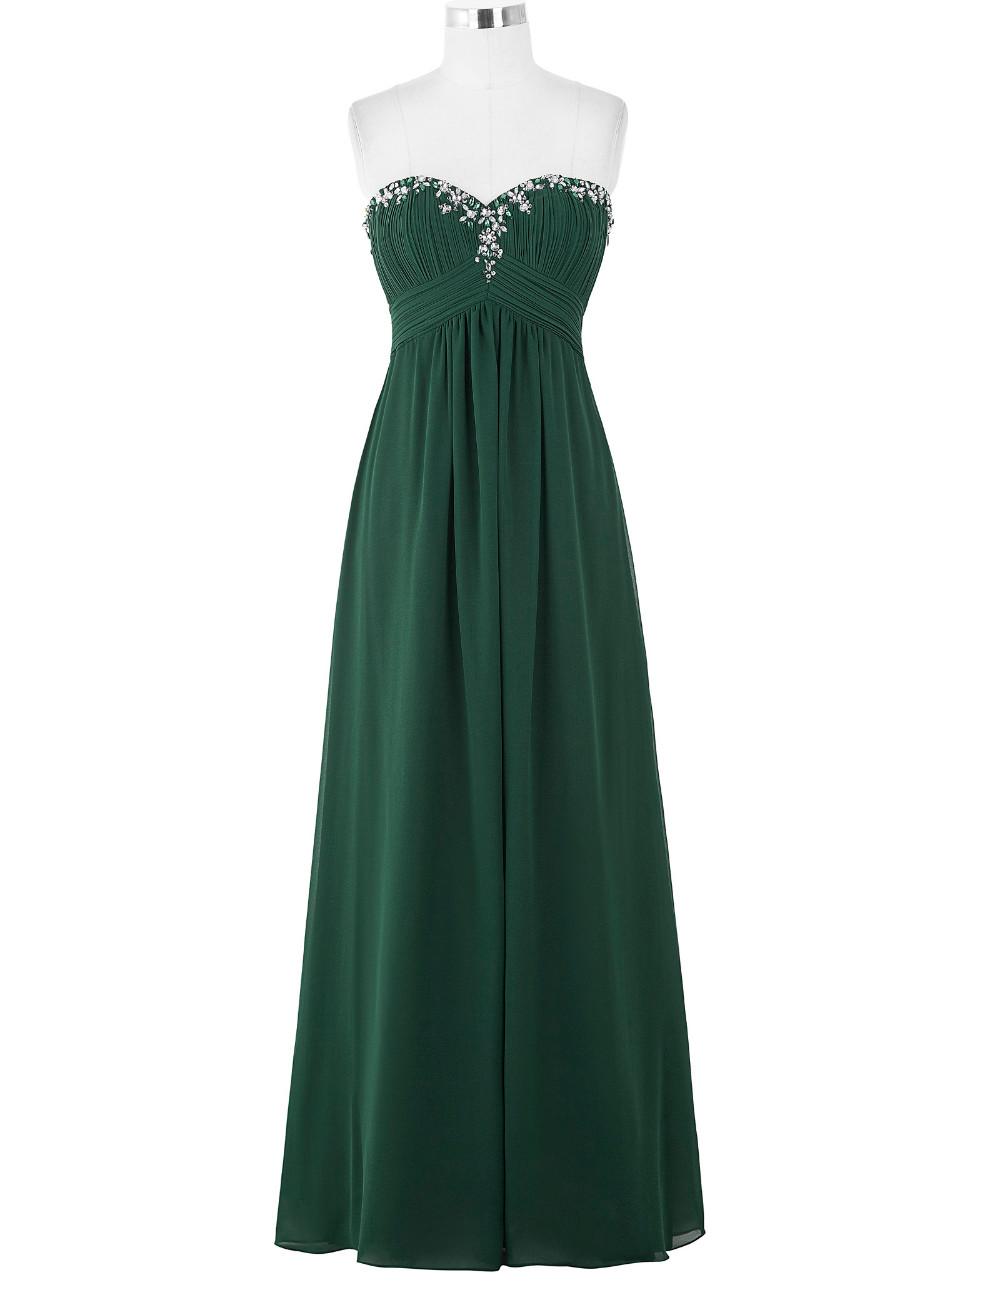 Lavender Green Blue Bridesmaid Dresses Long Wedding Party Dress Bruidsmeisjes Jurk Chiffon Gelinlik Prom Dresses for Bridesmaids 9